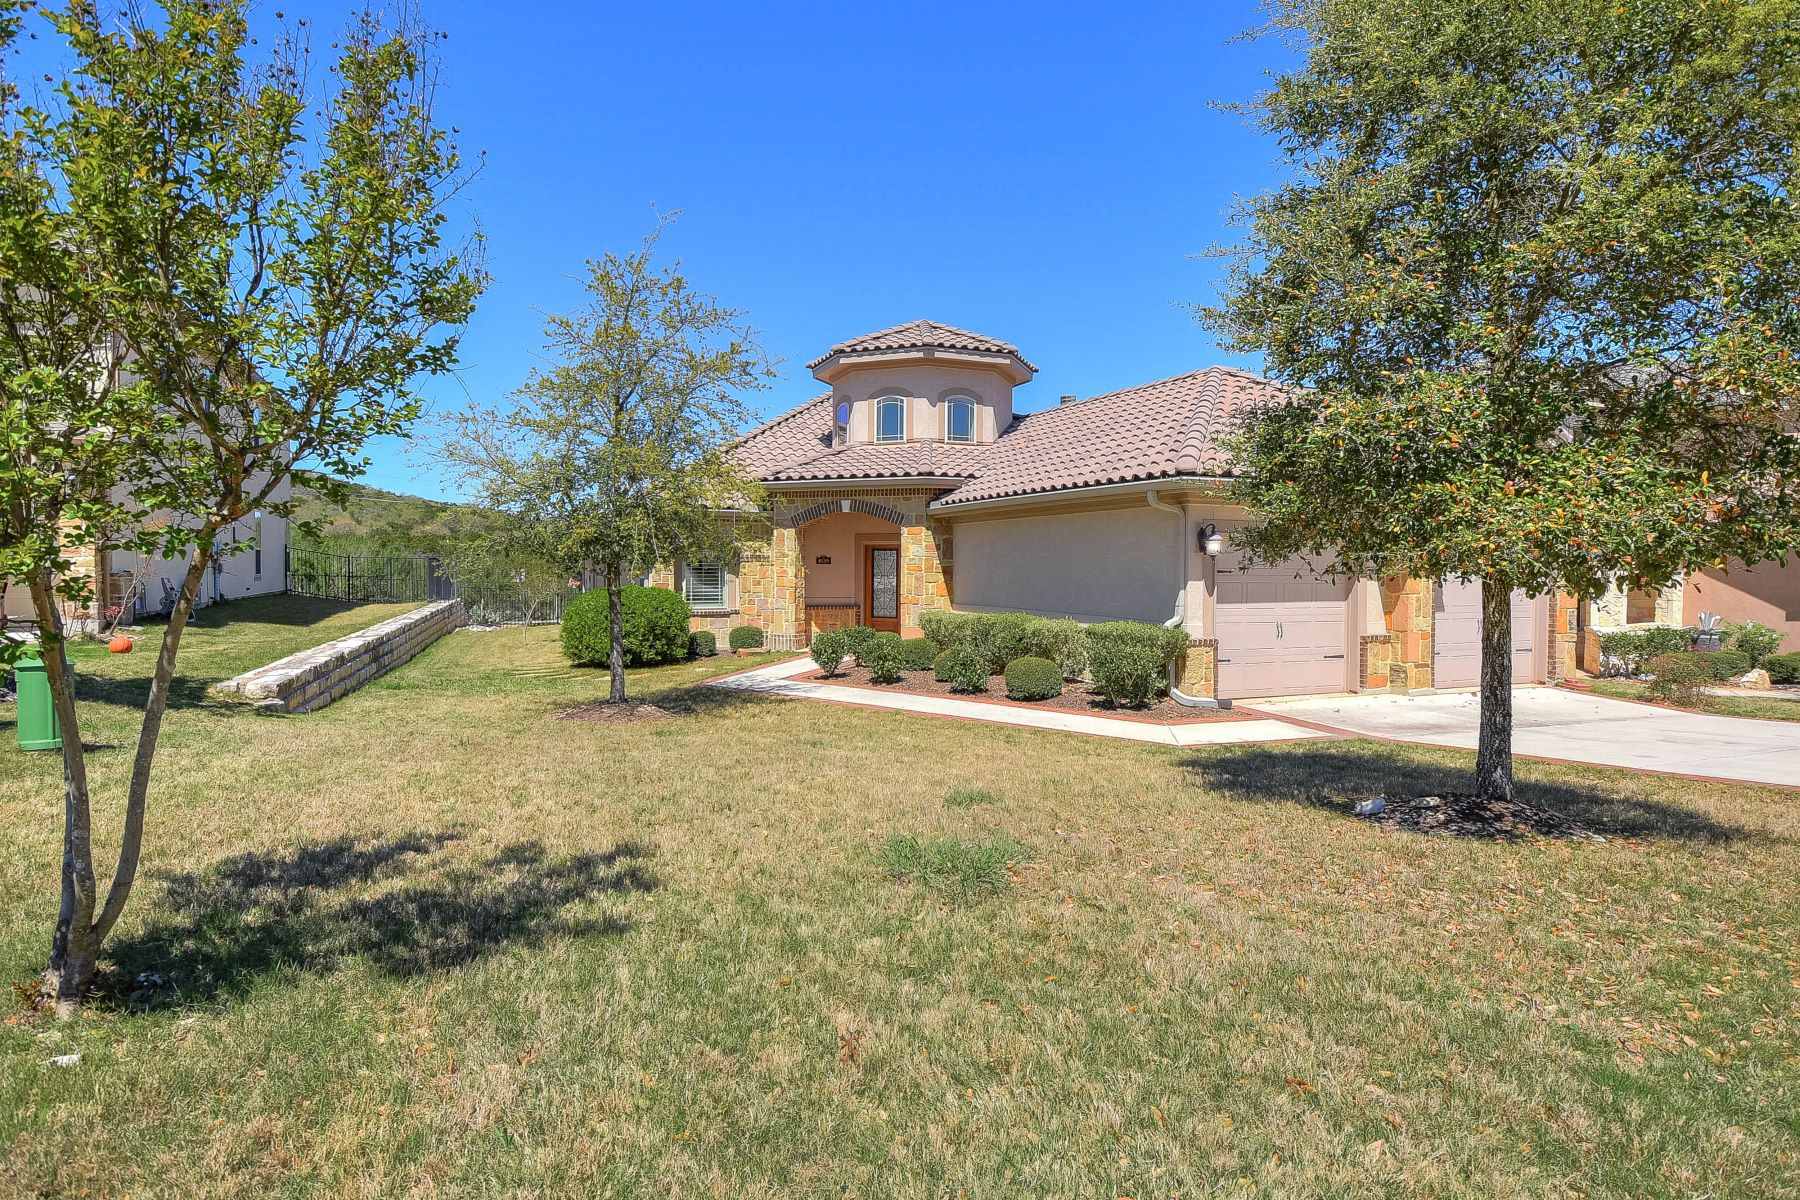 Single Family Home for Sale at Home in Sonoma Verde 8139 Powderhorn Run San Antonio, Texas 78255 United States